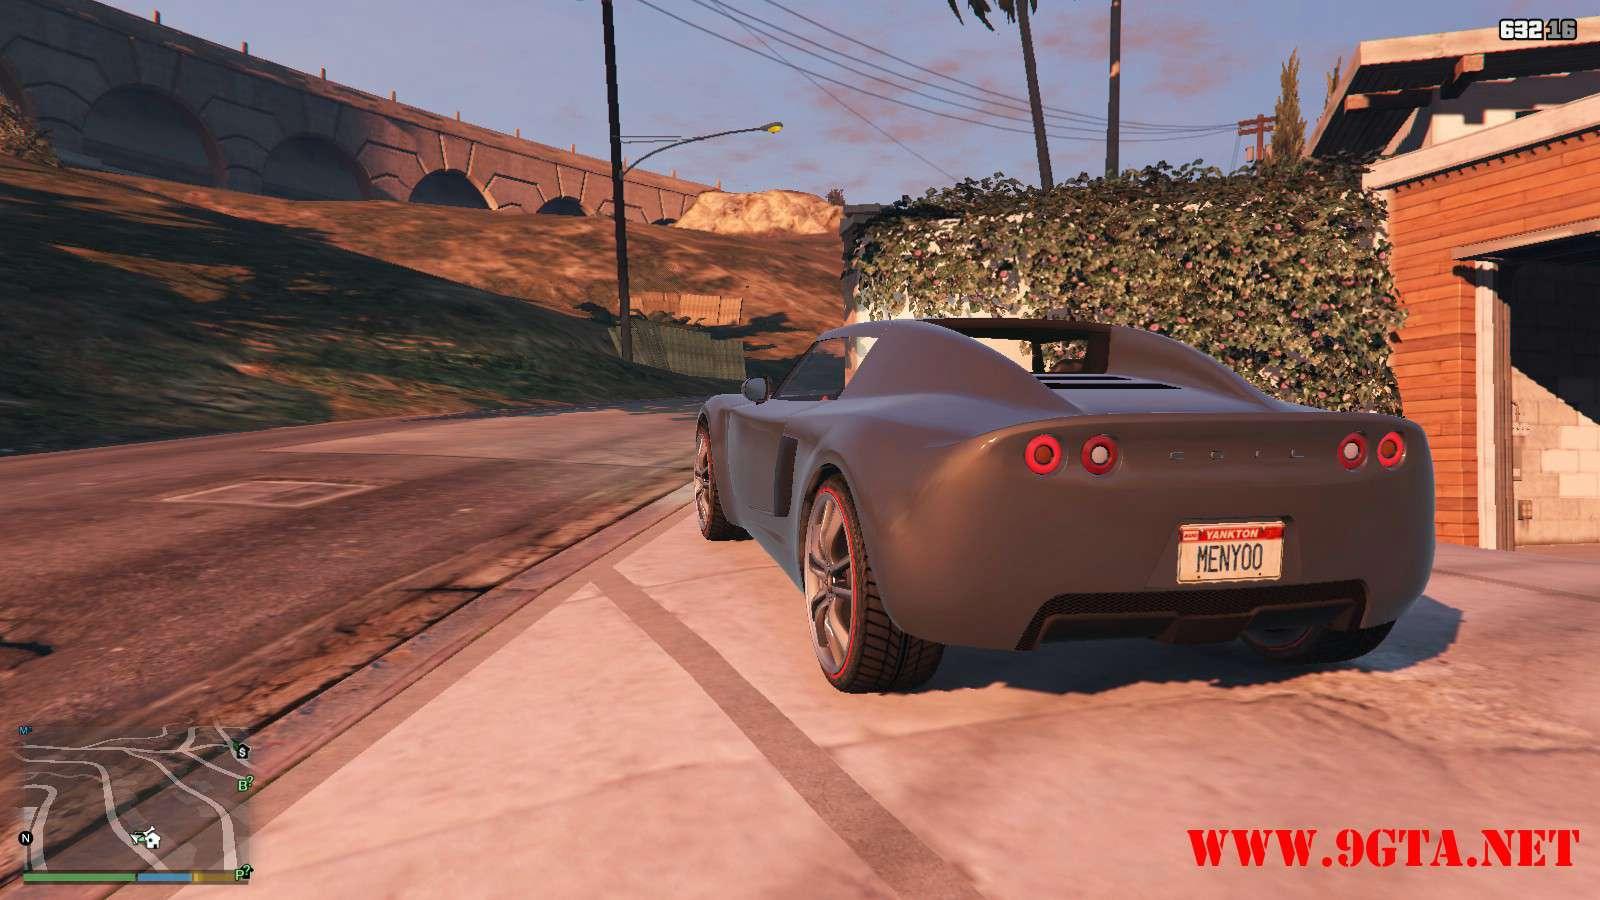 Coil Exode S GTA5 Mods (10)